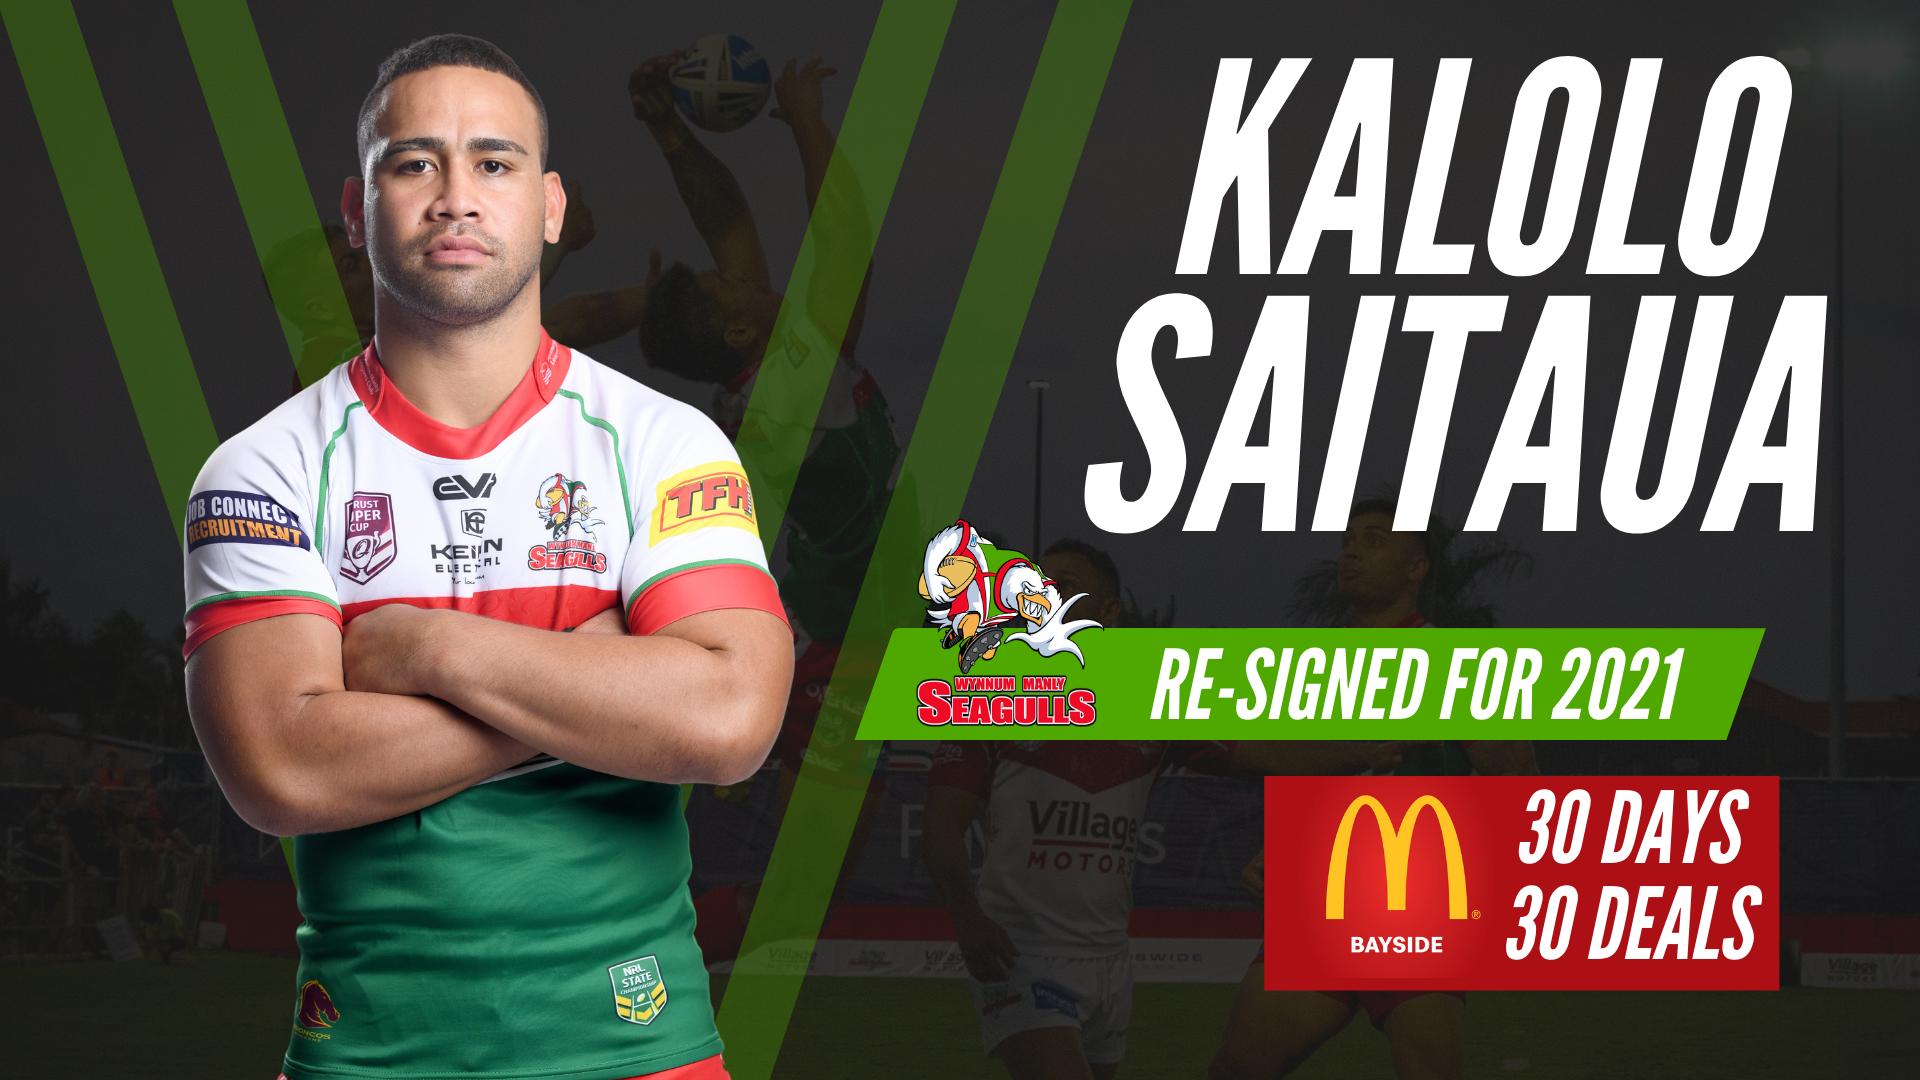 Kalolo Saitaua re-signs with the Gulls